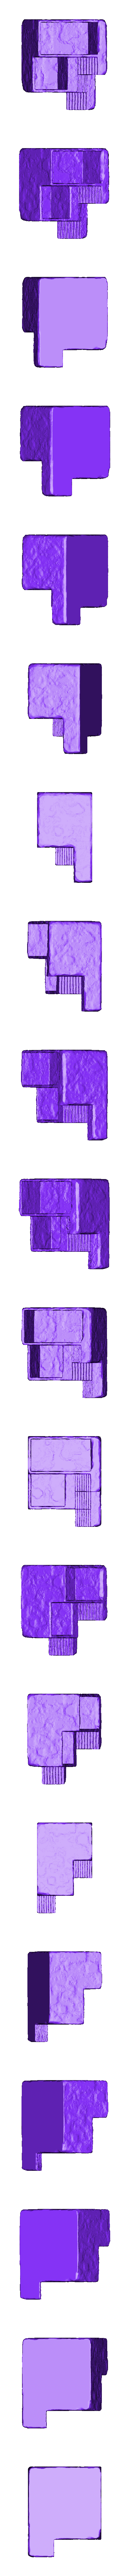 Rock.stl Download free STL file Flower_pot • 3D printing object, 02_mm